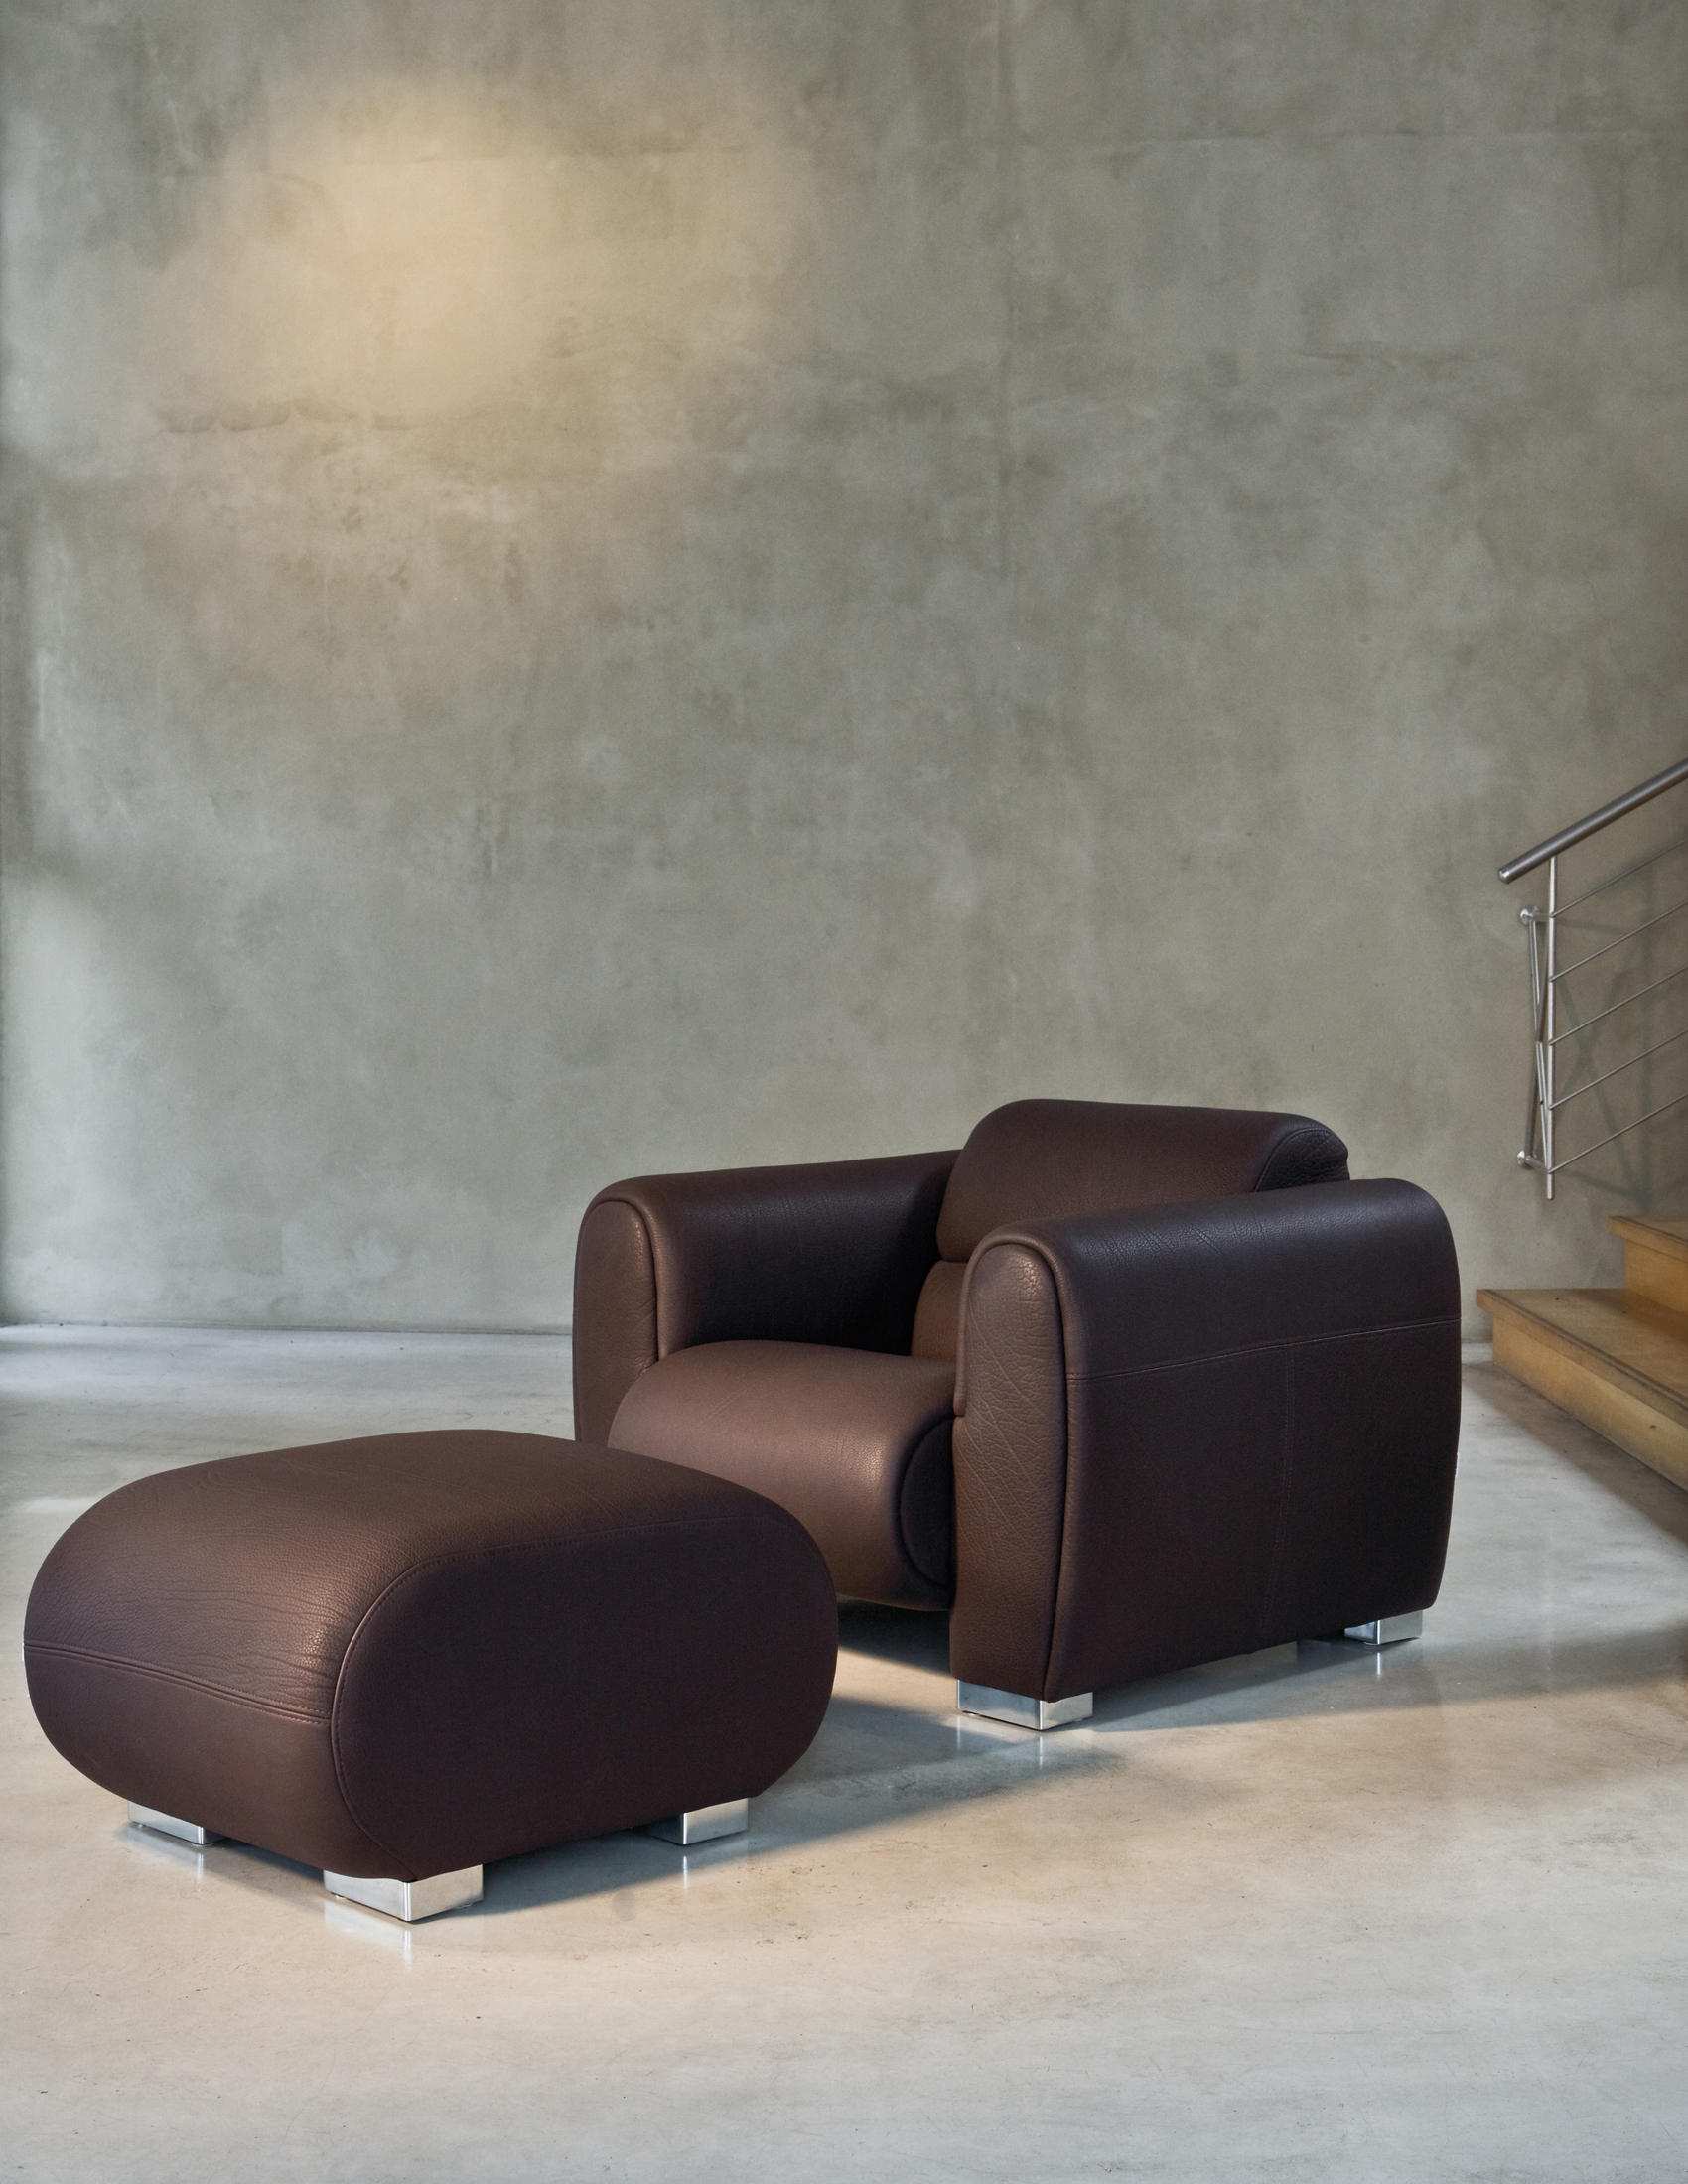 sumo 2 sofa sof s de br hl architonic. Black Bedroom Furniture Sets. Home Design Ideas